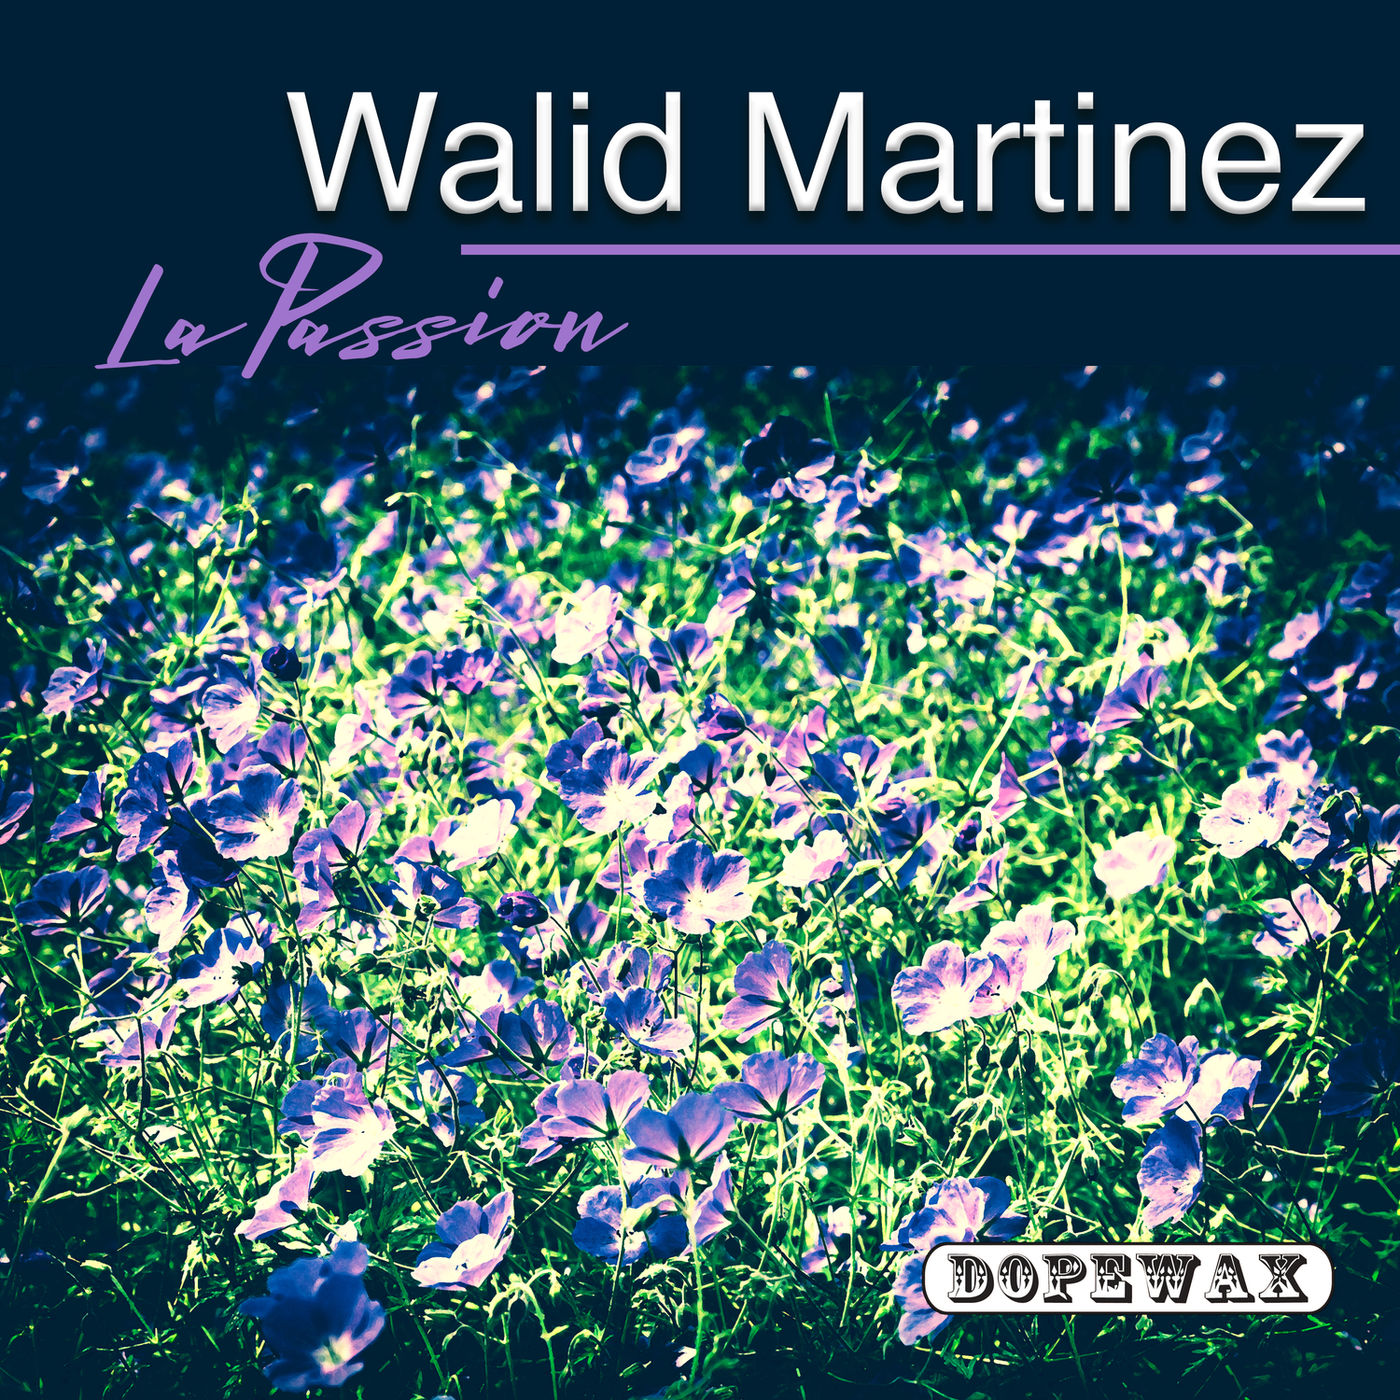 Walid Martinez - La Passion (Original Mix)